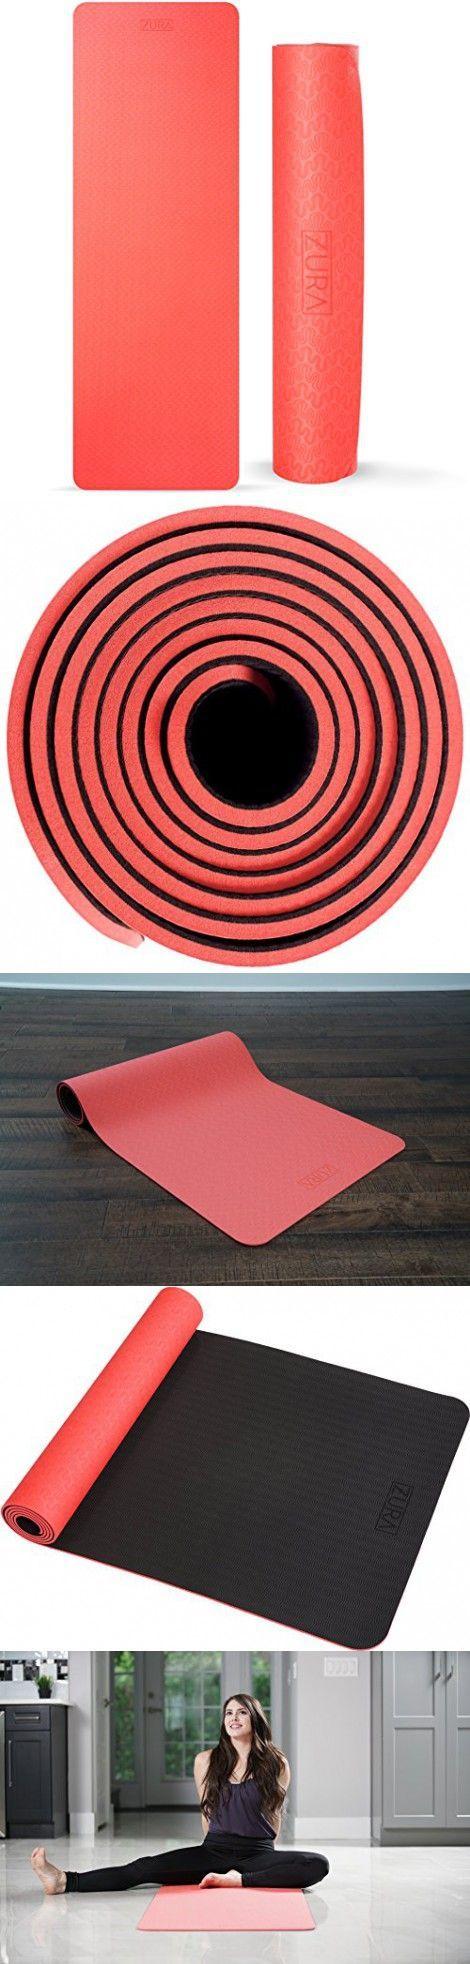 ZuraYoga Nonslip Travel Yoga Mat, Best Reversible 2-in-1 Eco-Friendly Yoga Mat - Lightweight Exercise Mat, 5 mm Thick (Red Black)